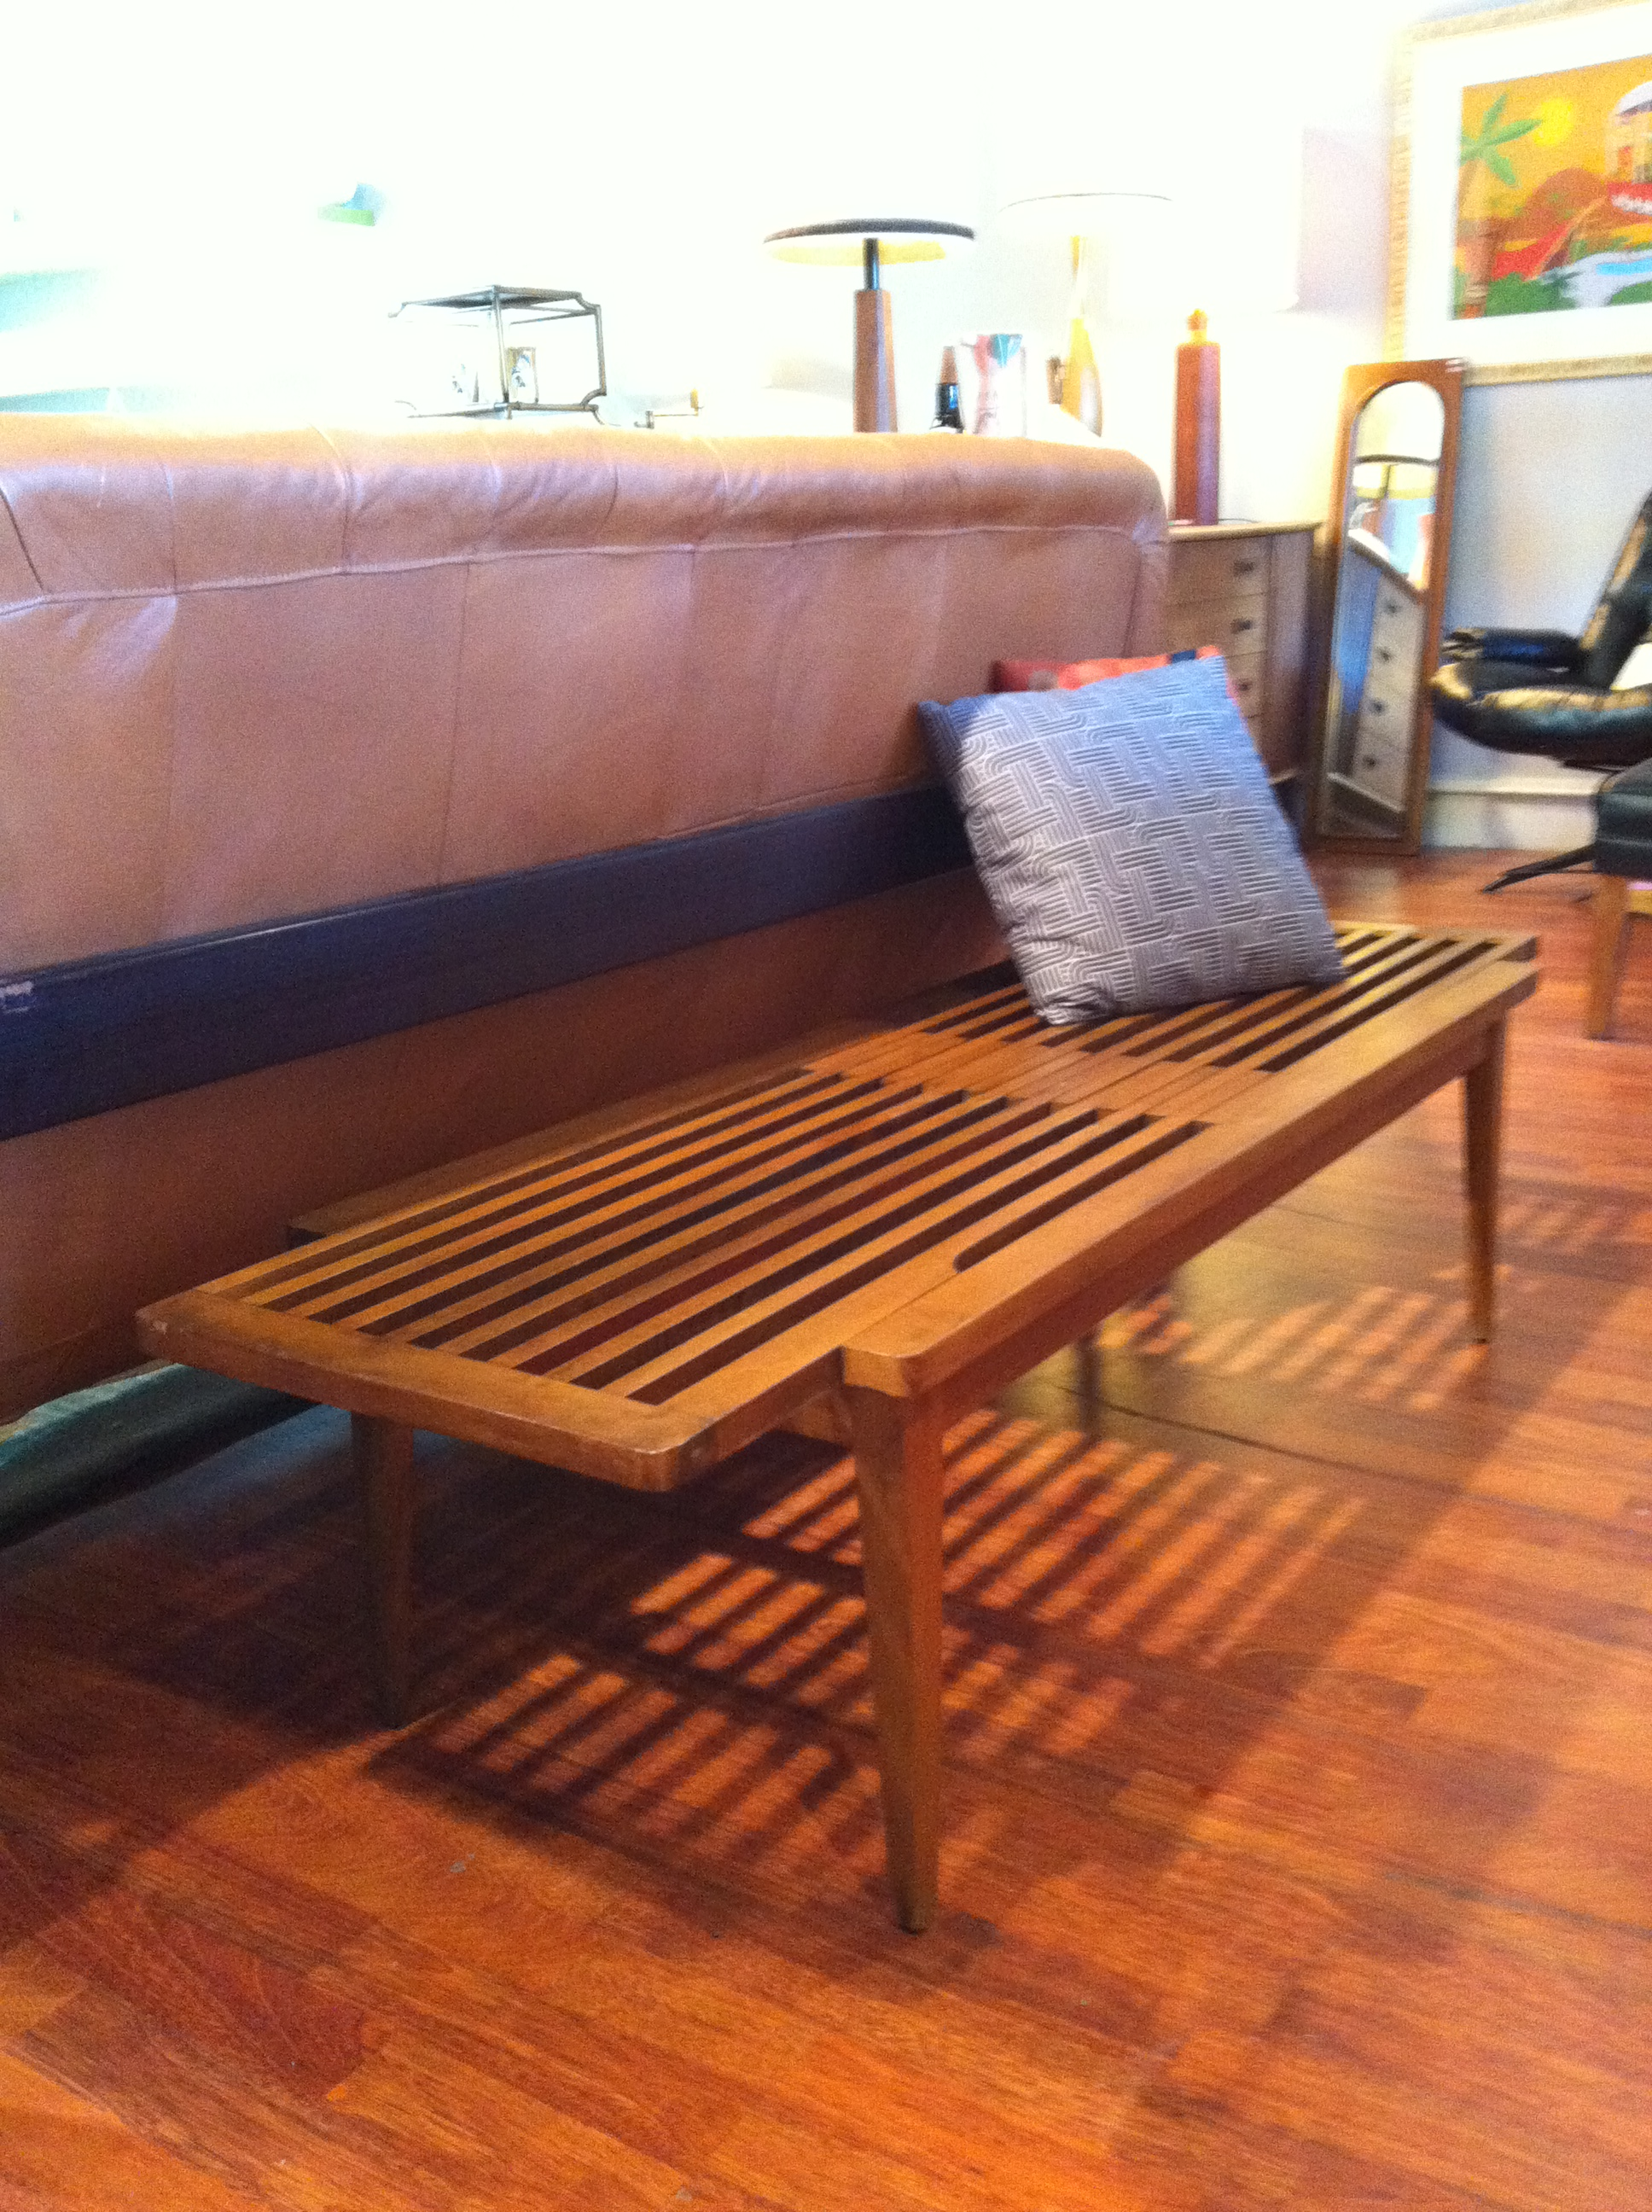 Gallery Vintage mid century modern expandable slat bench